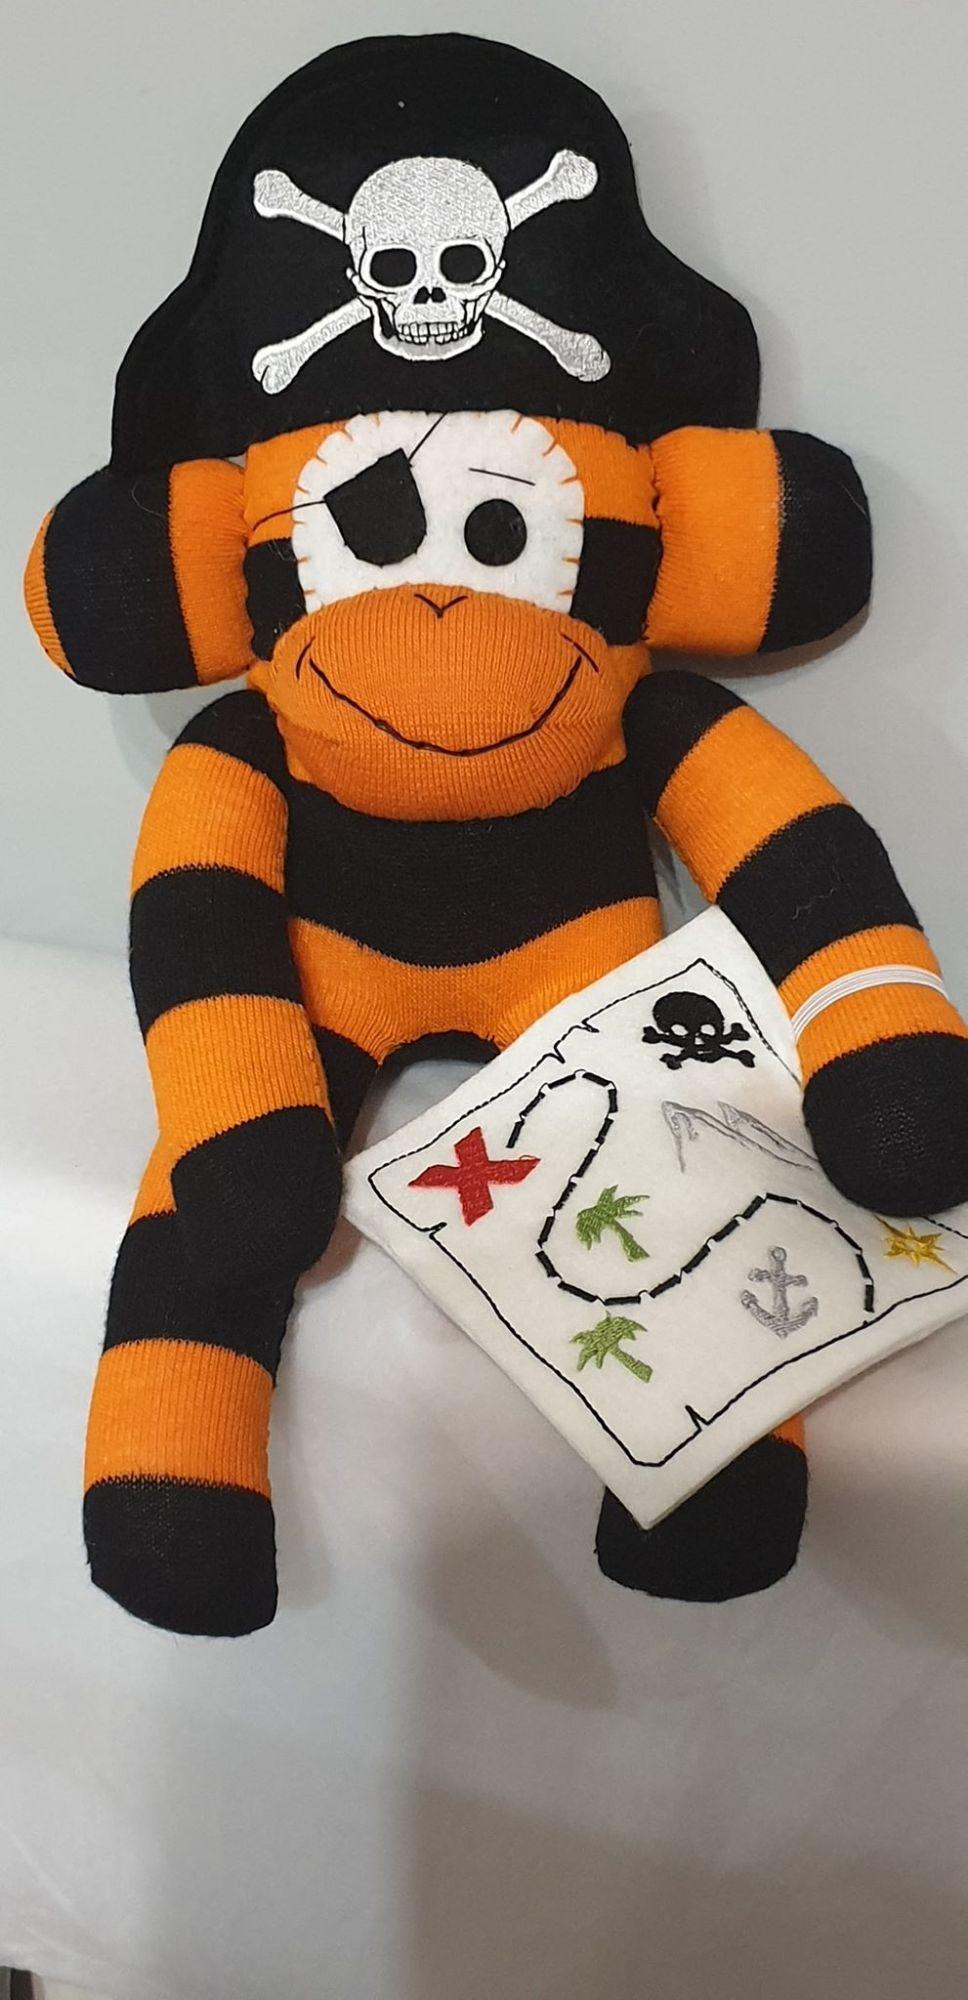 Orange & Black Striped Sock Monkey Pirate